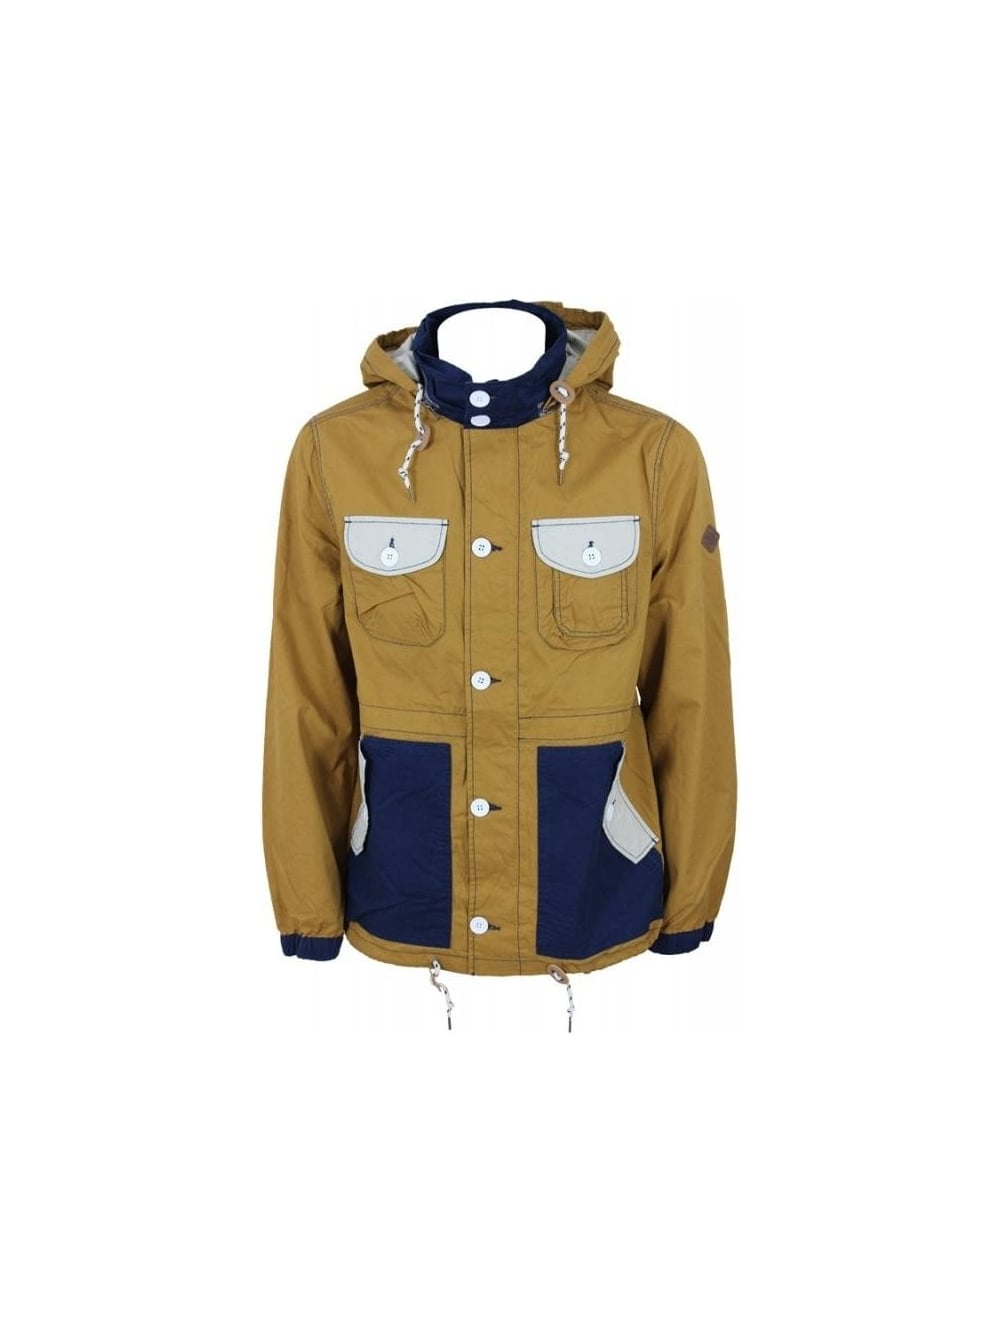 6642eb65c6f Bellfield Hideout Fisherman Jacket in Mustard - Northern Threads